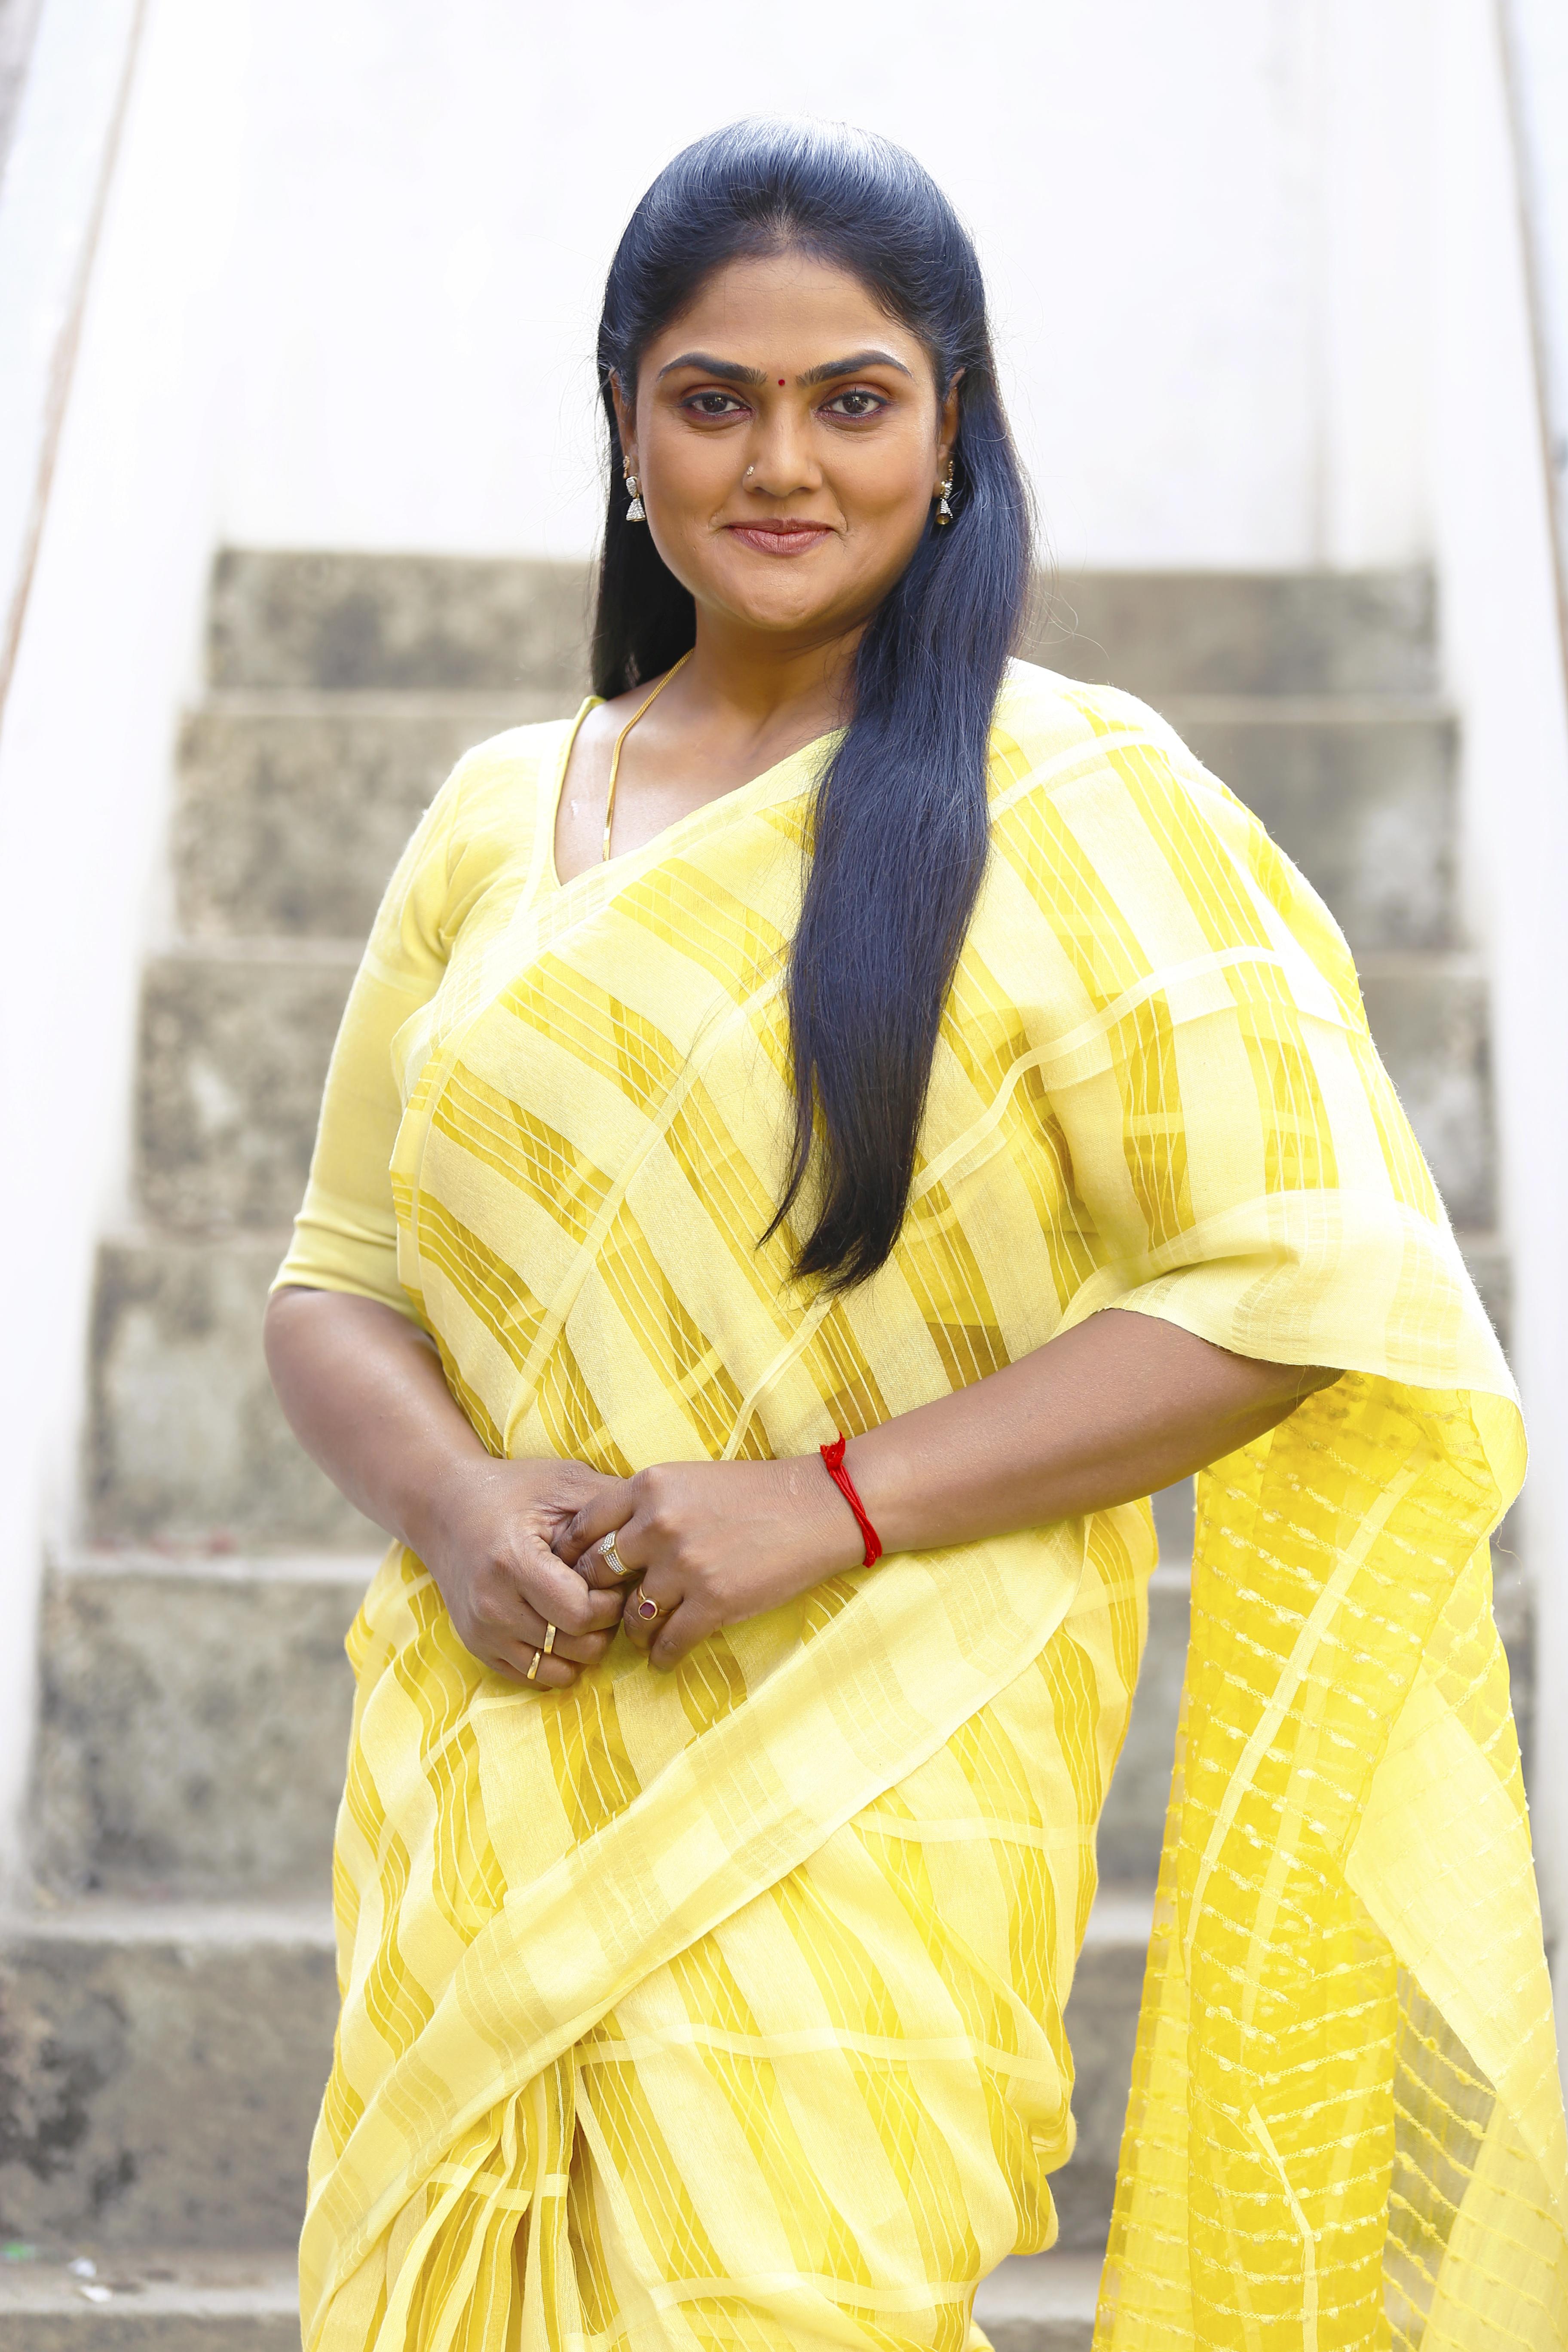 Forum on this topic: Anupriya Kapoor 2010, nirosha/